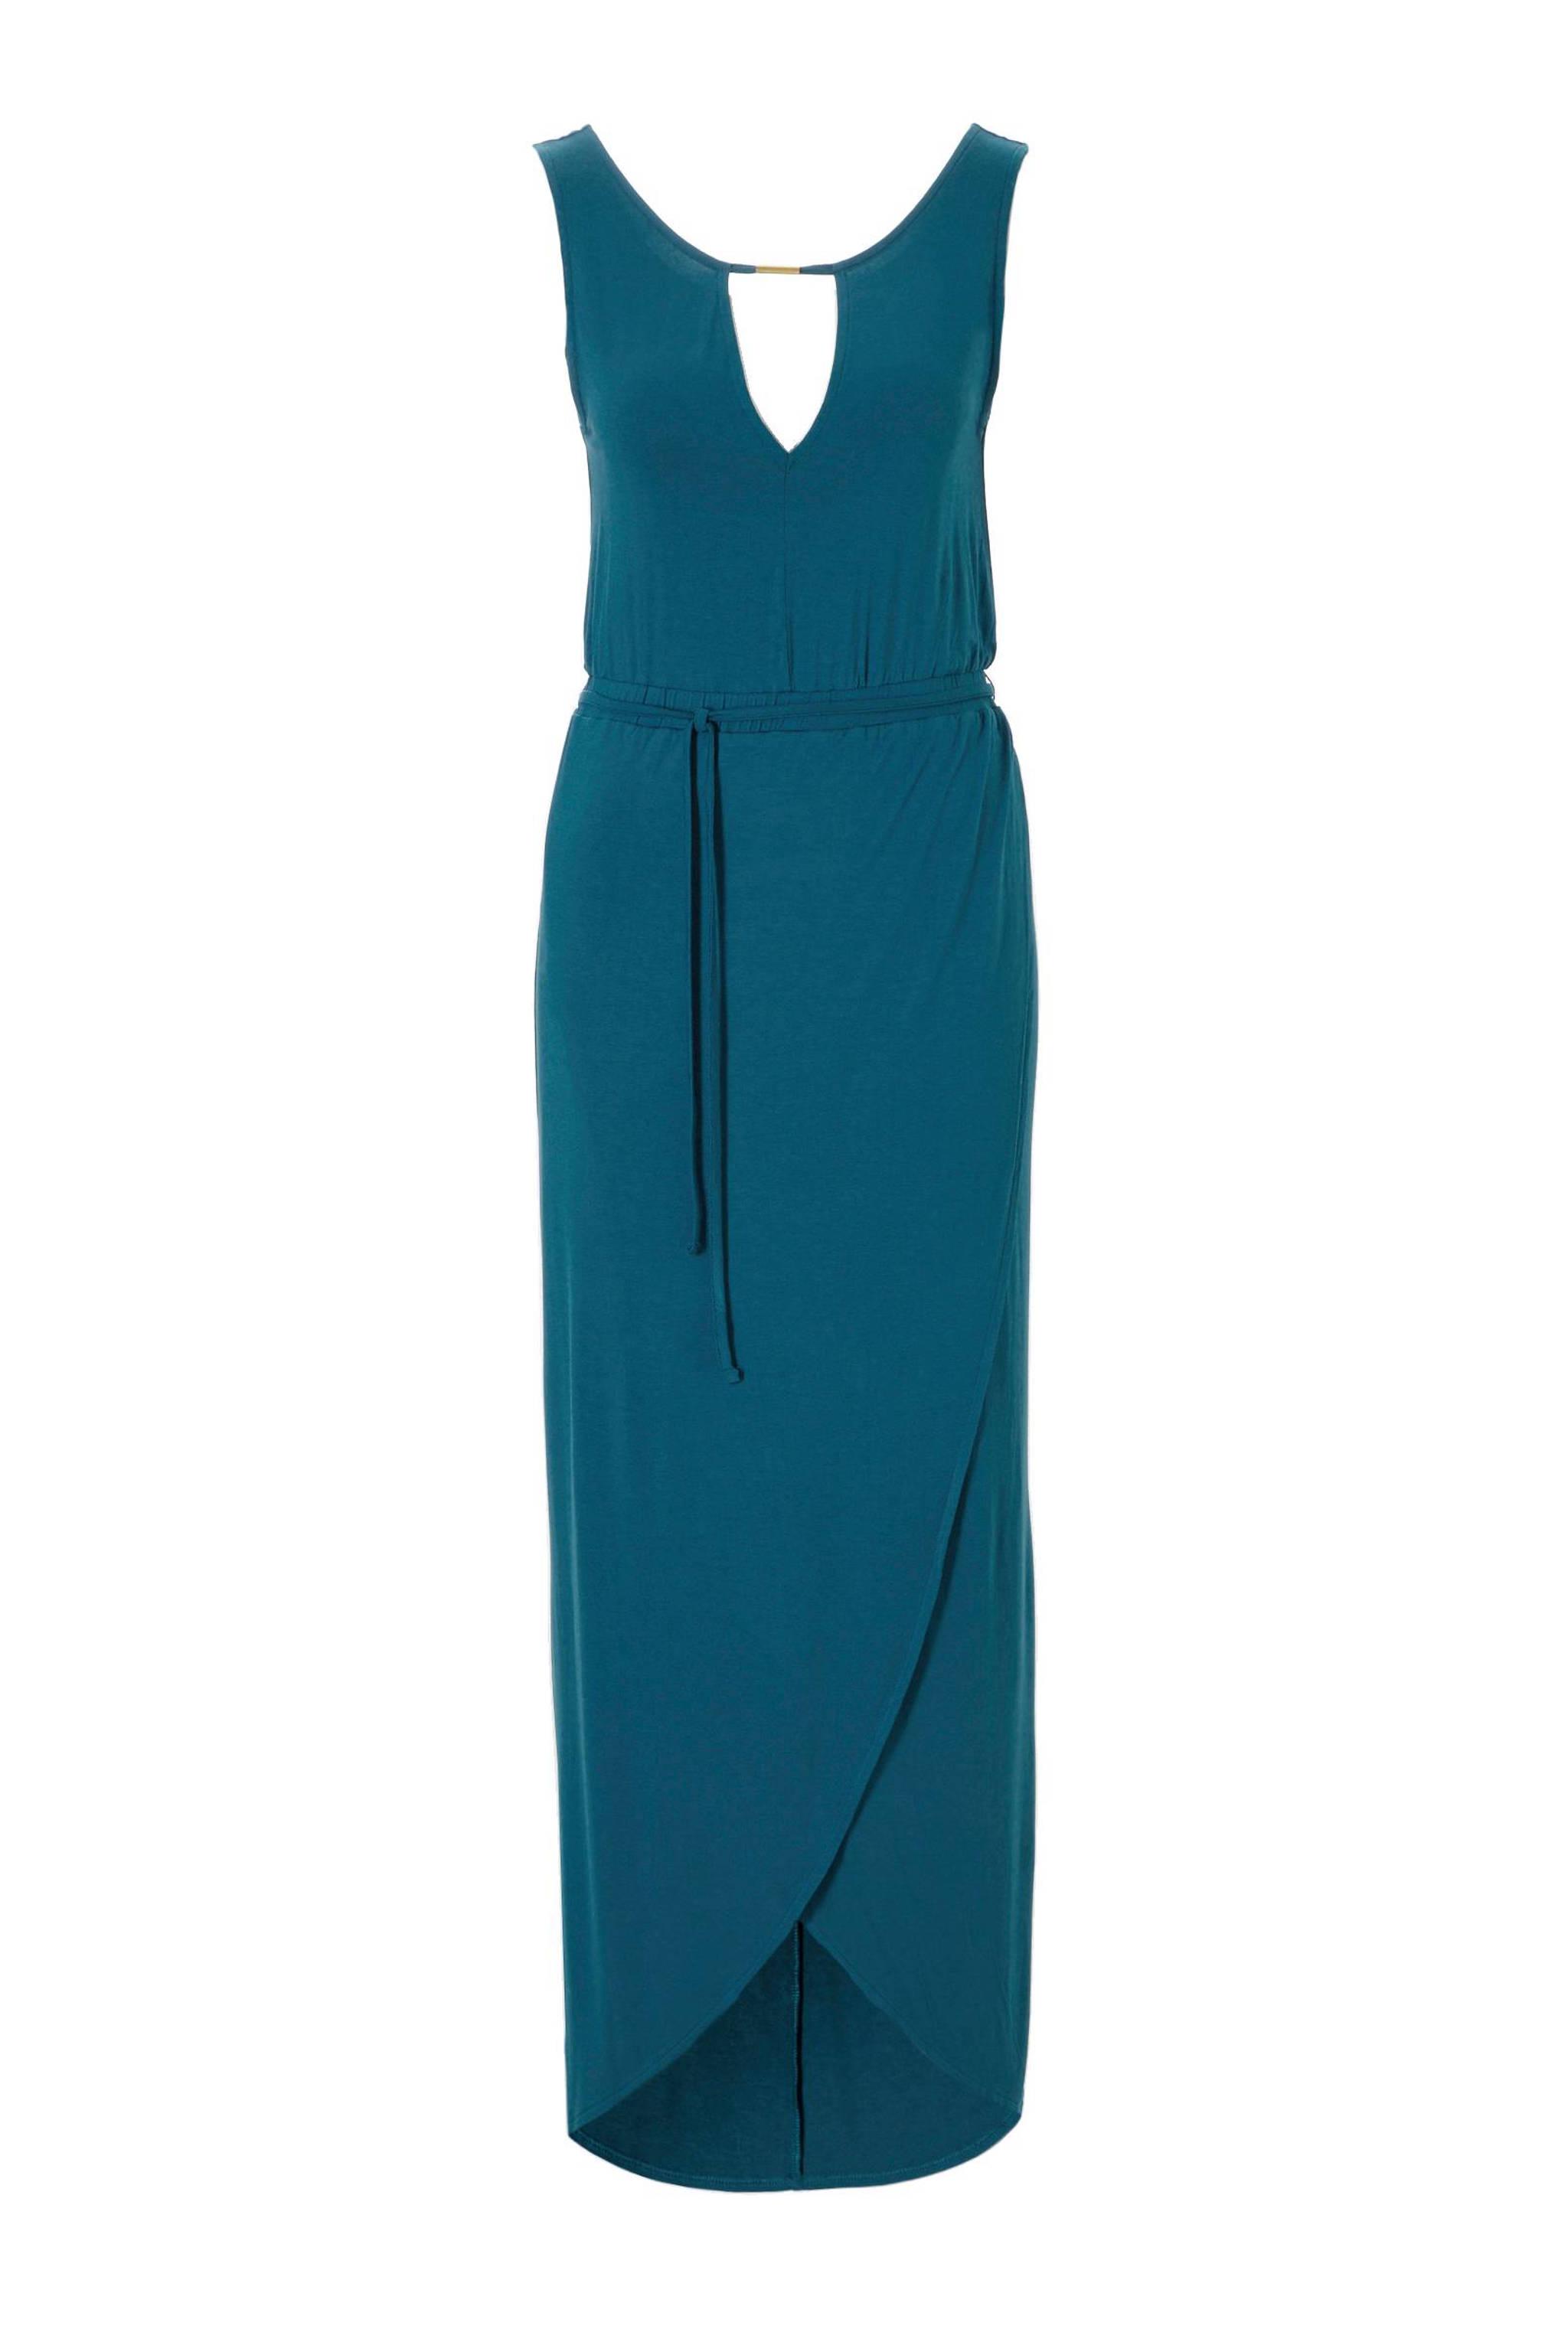 4e21ec23806057 whkmp s beachwave maxi jurk met wikkel-look